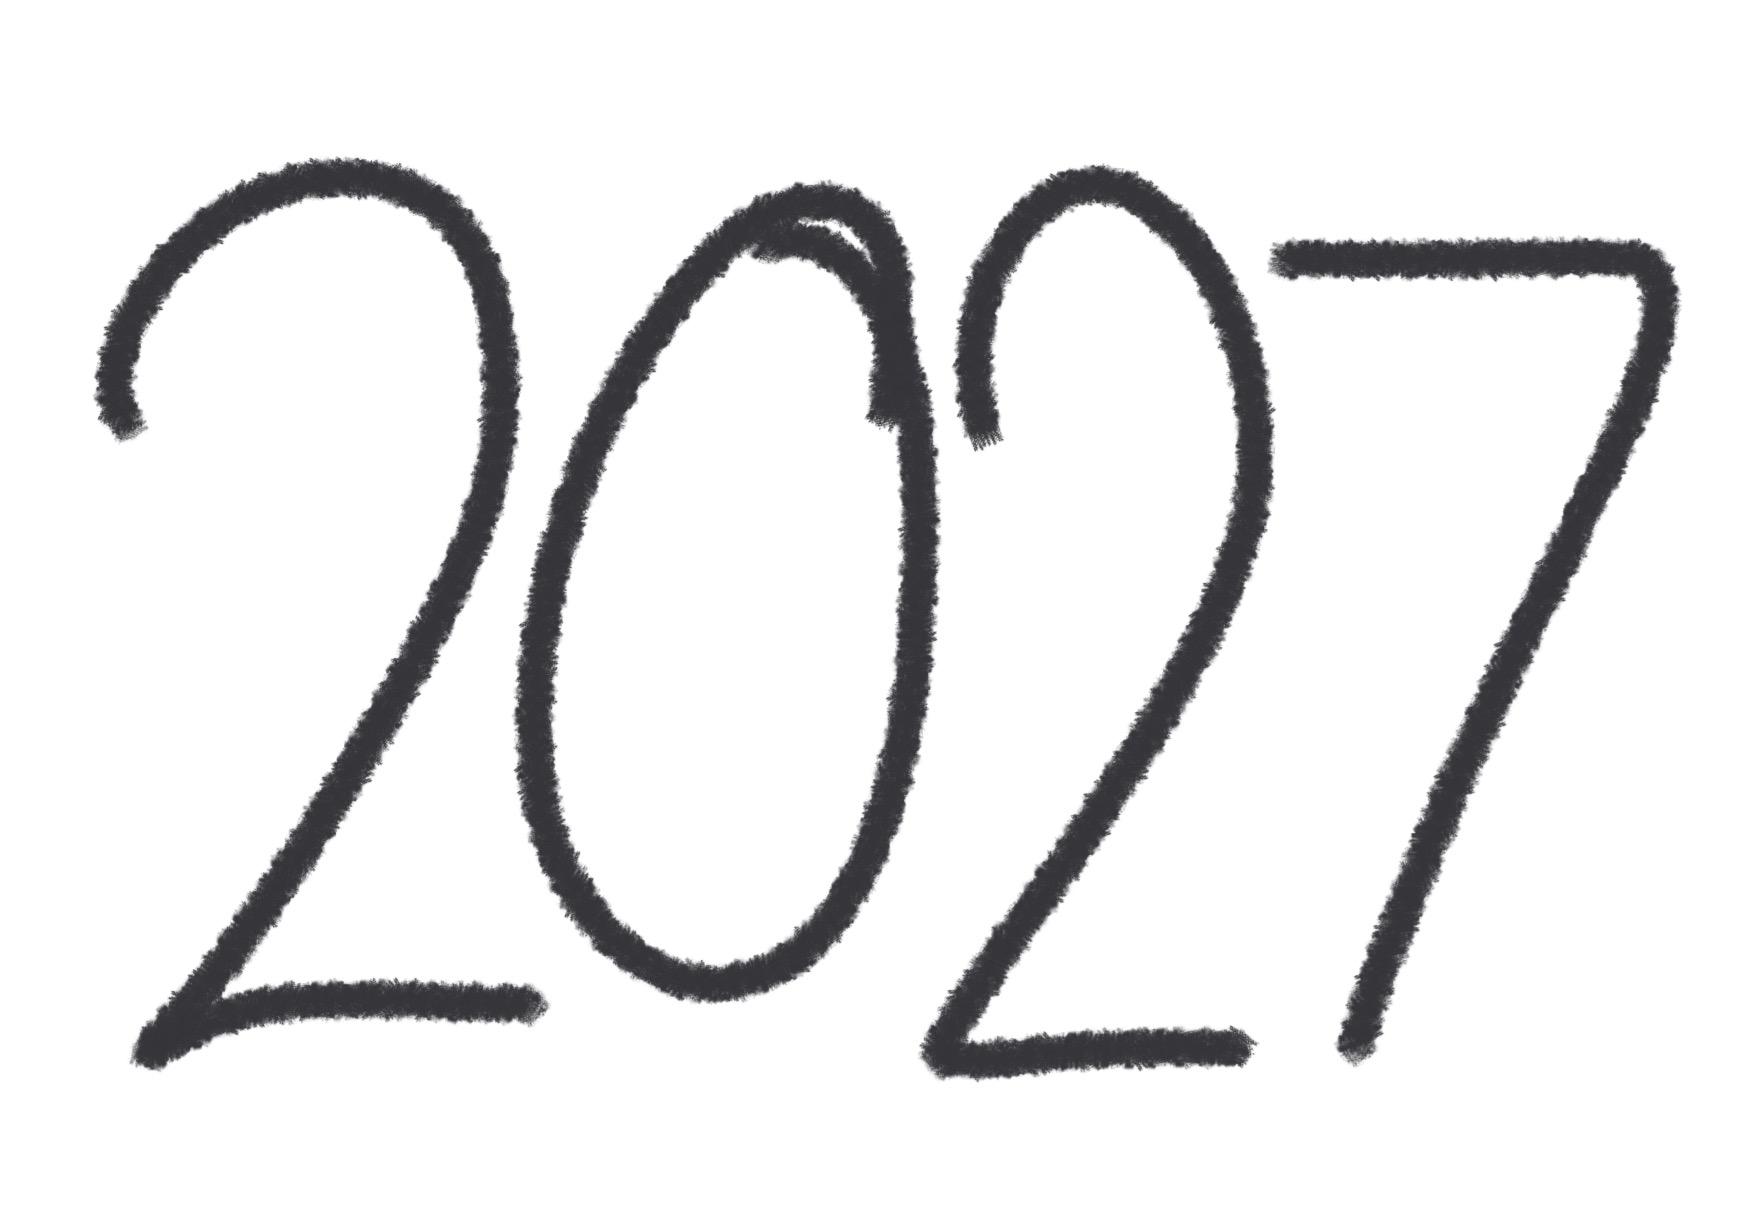 2,027